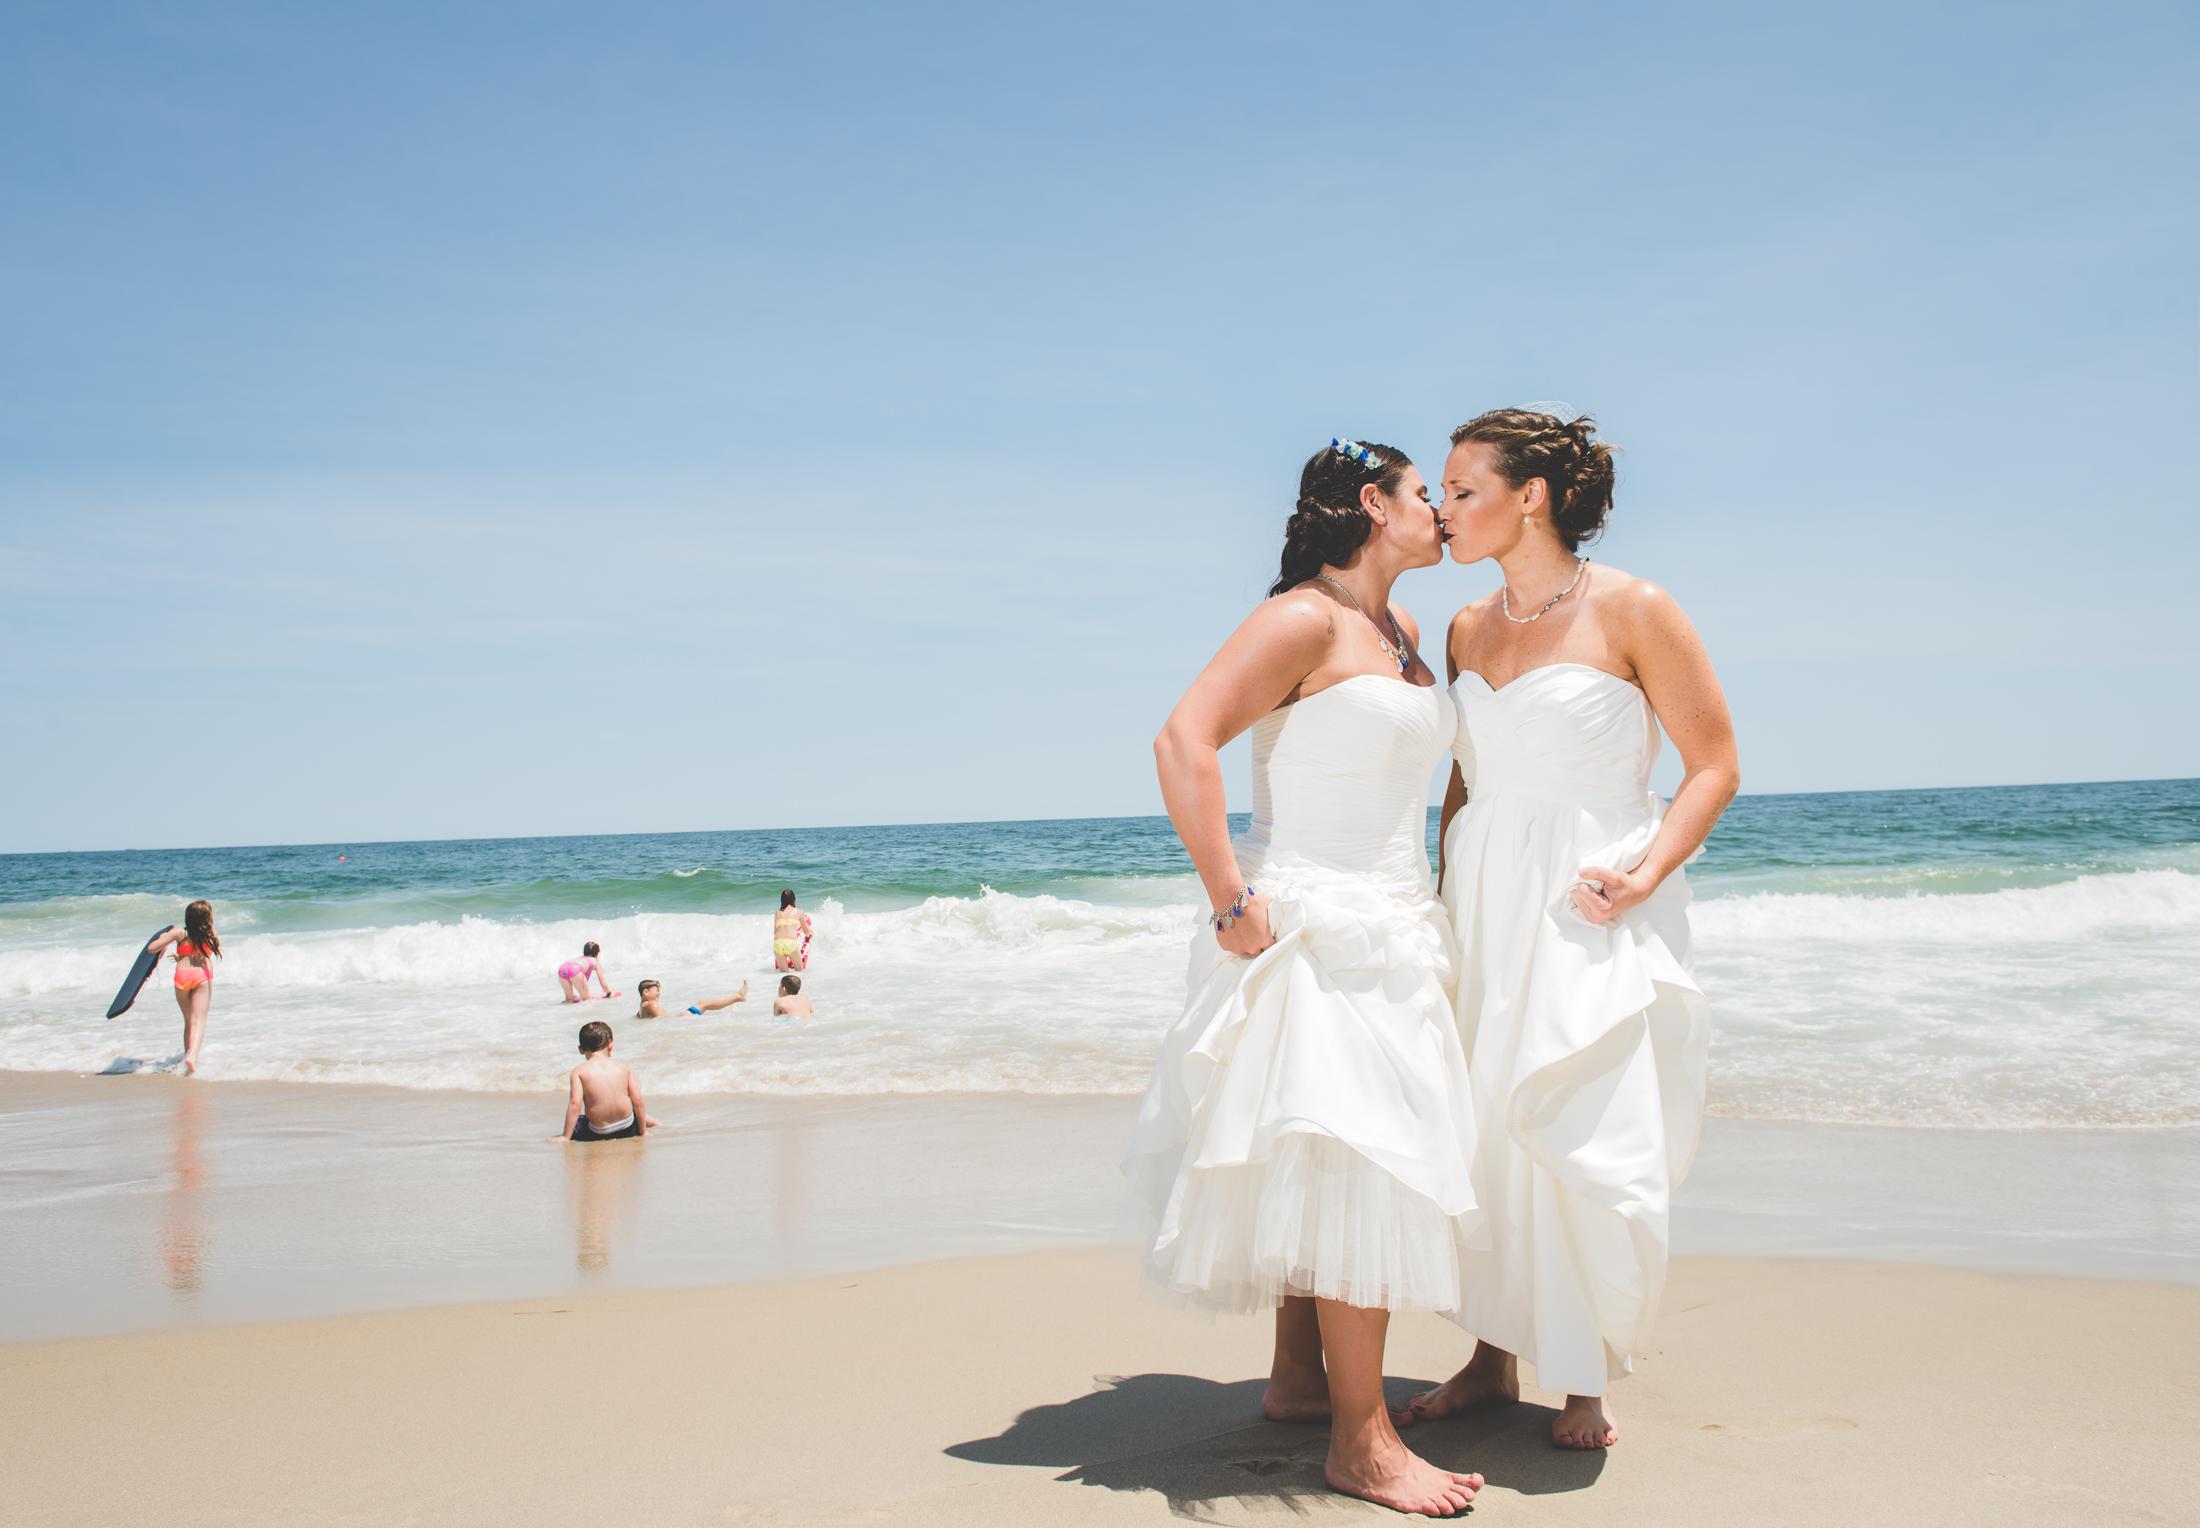 The Top Five LGBT Honeymoon Destinations